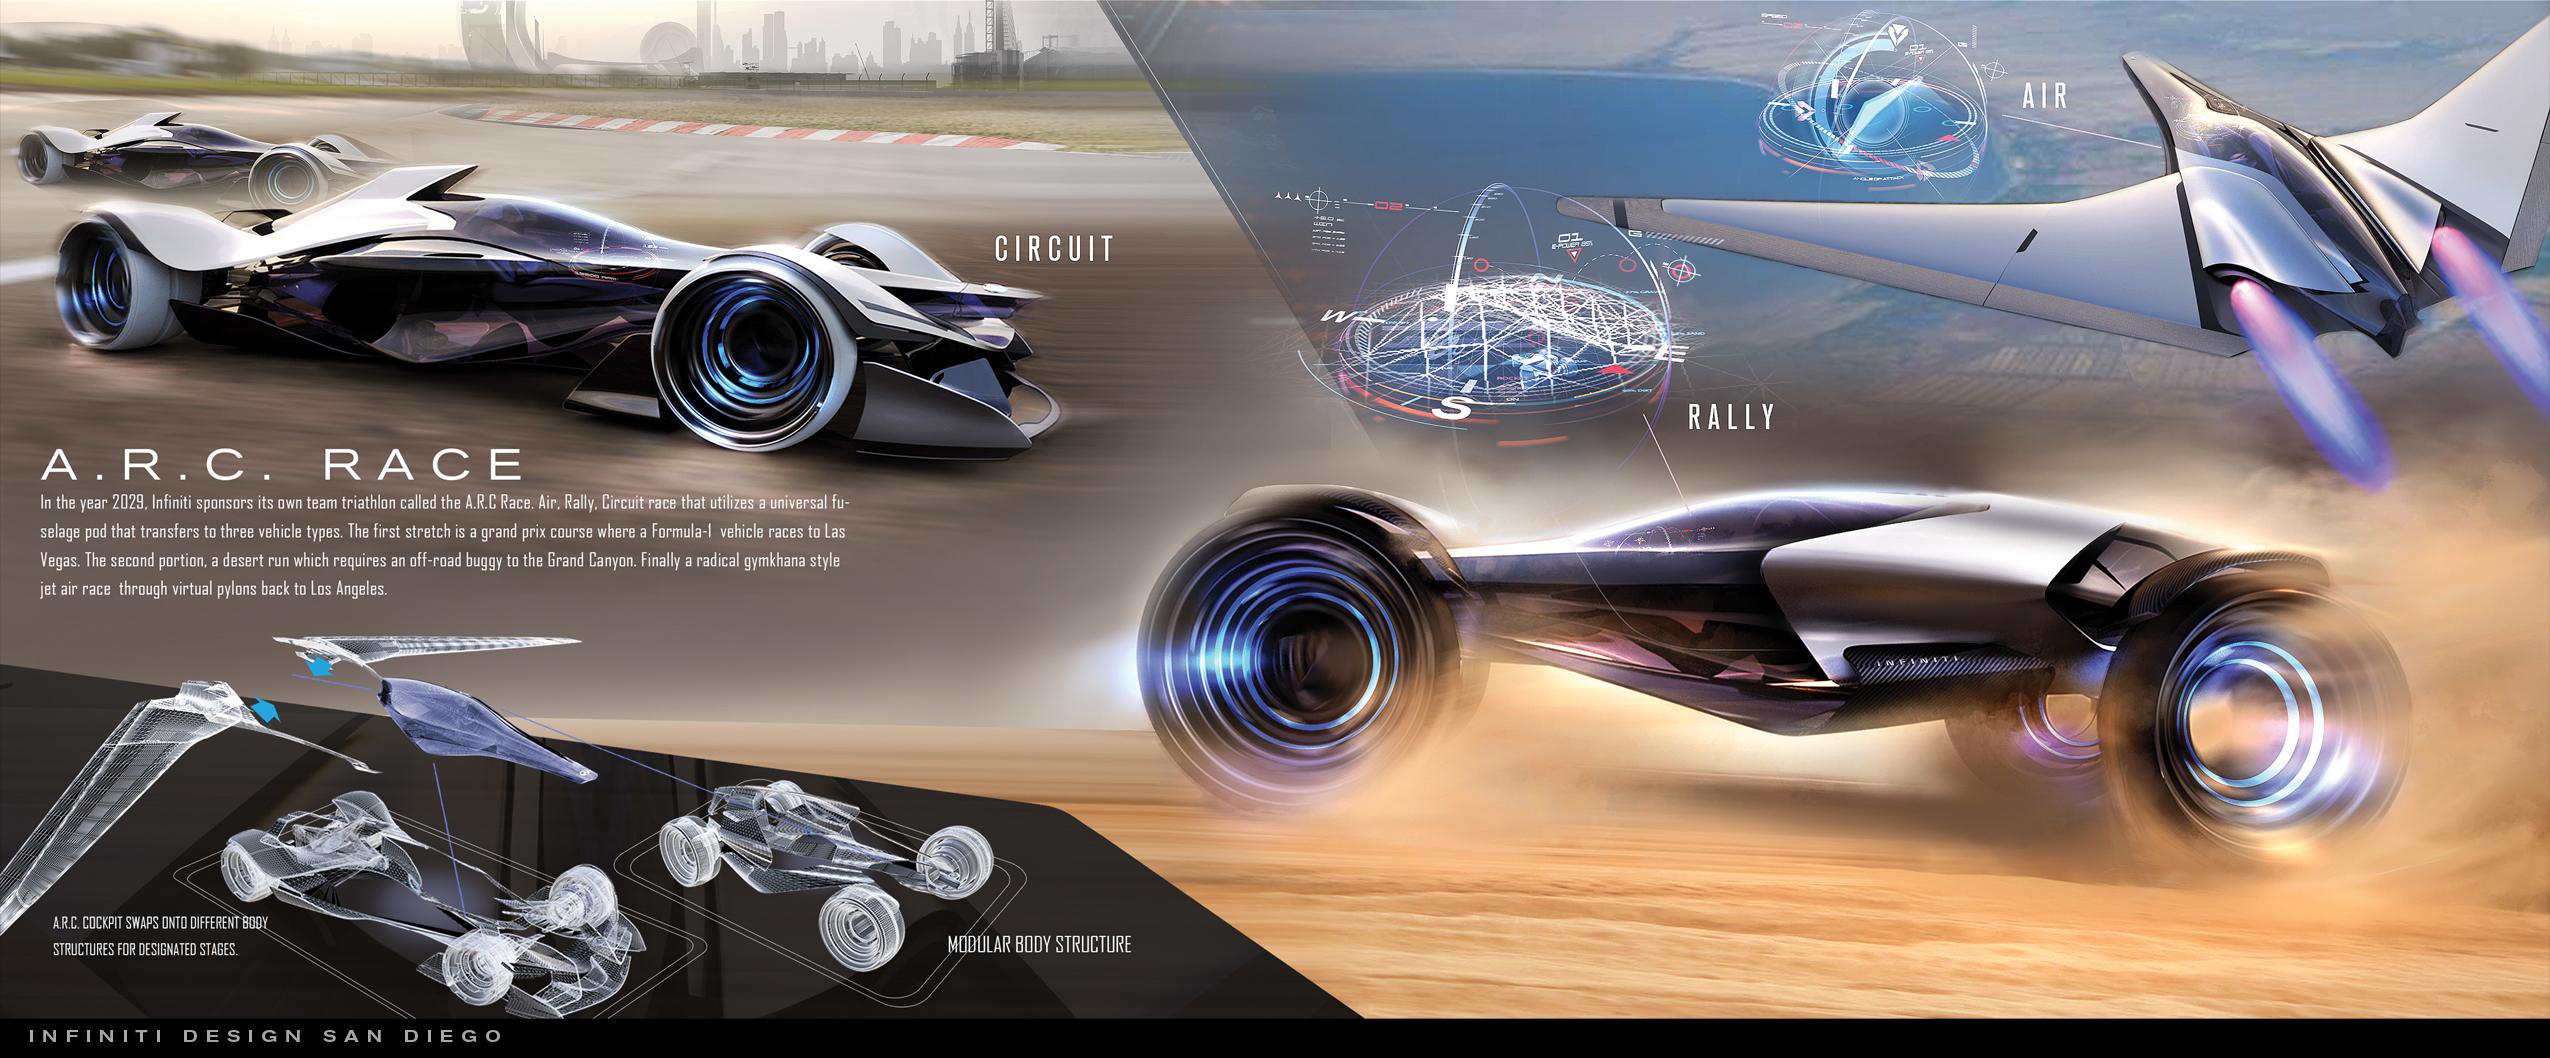 Wallpaper : vehicle, 2015, Infiniti, netcarshow, netcar, car